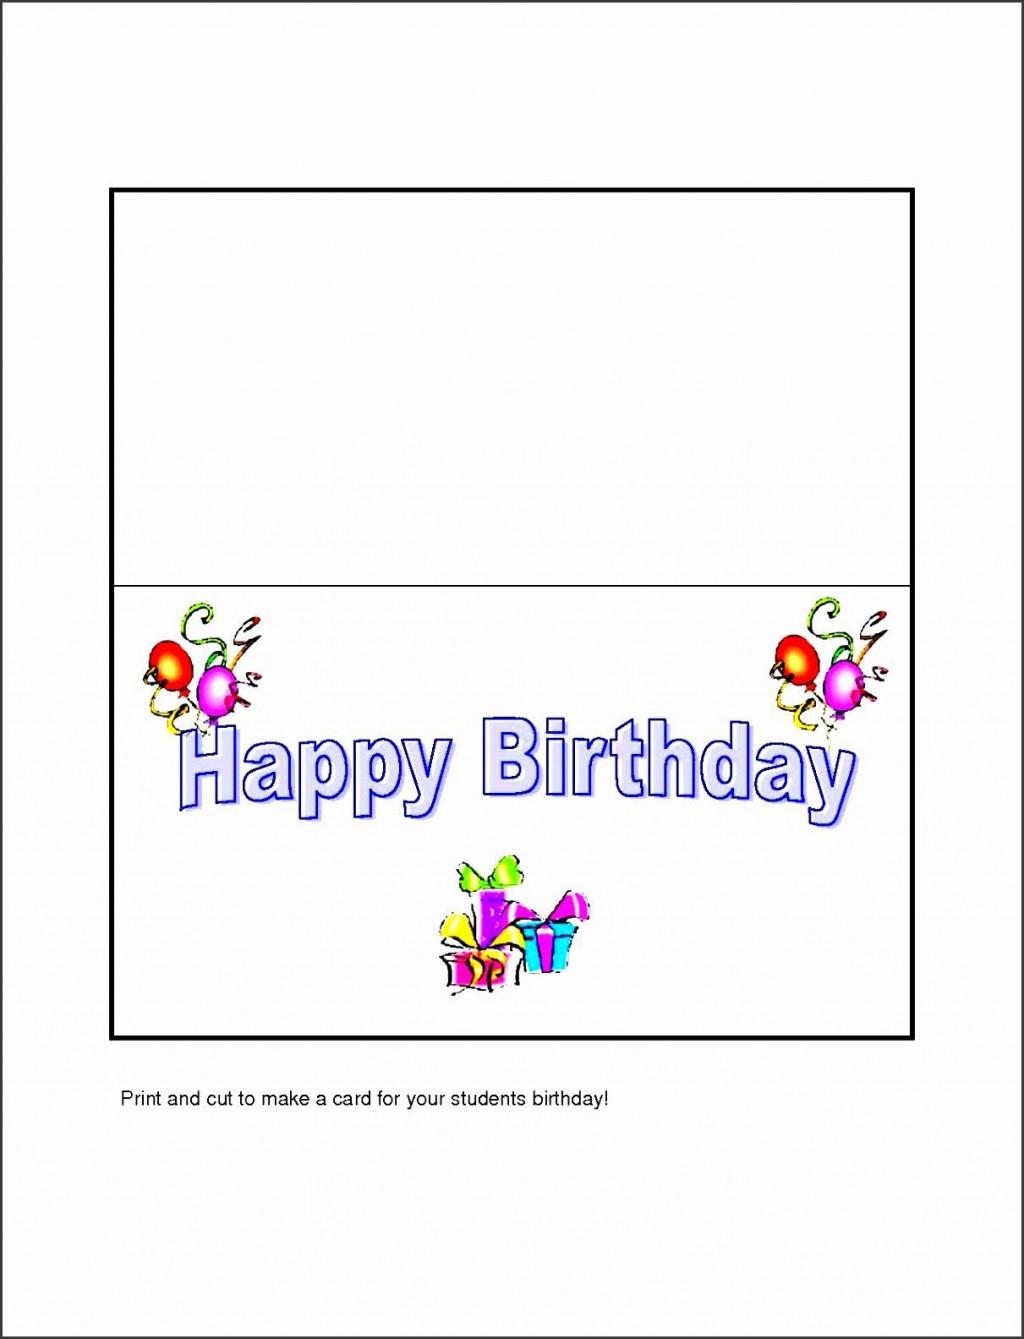 007 Amazing Microsoft Word Greeting Card Template Design  Birthday Blank Free 2007Large